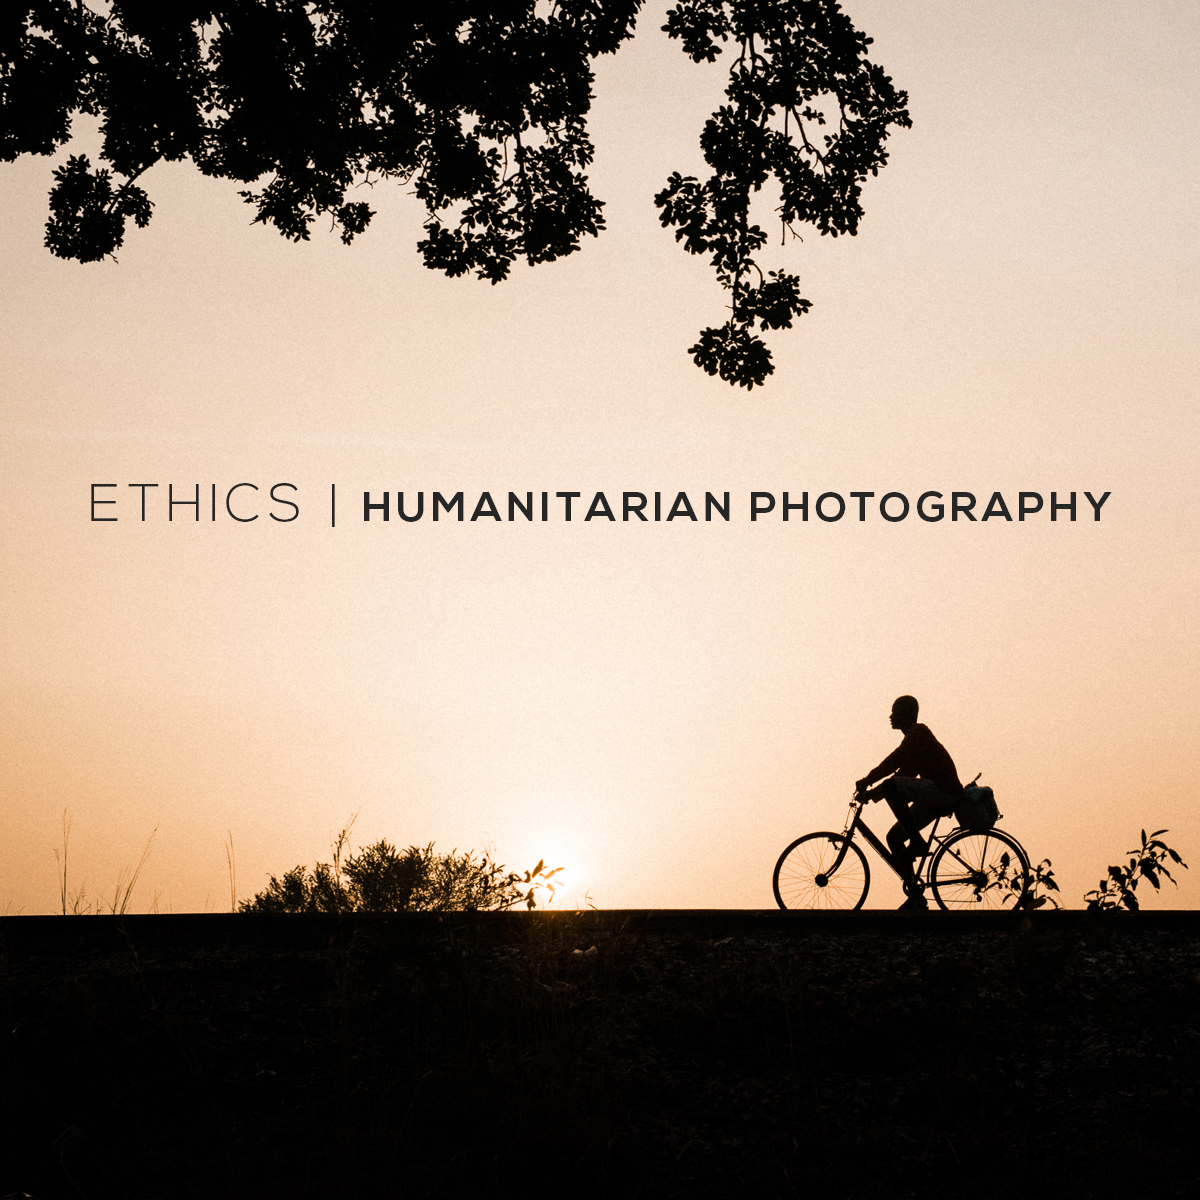 Ethics_Humanitarian_Photography_TaraShupePhotography_024.jpg